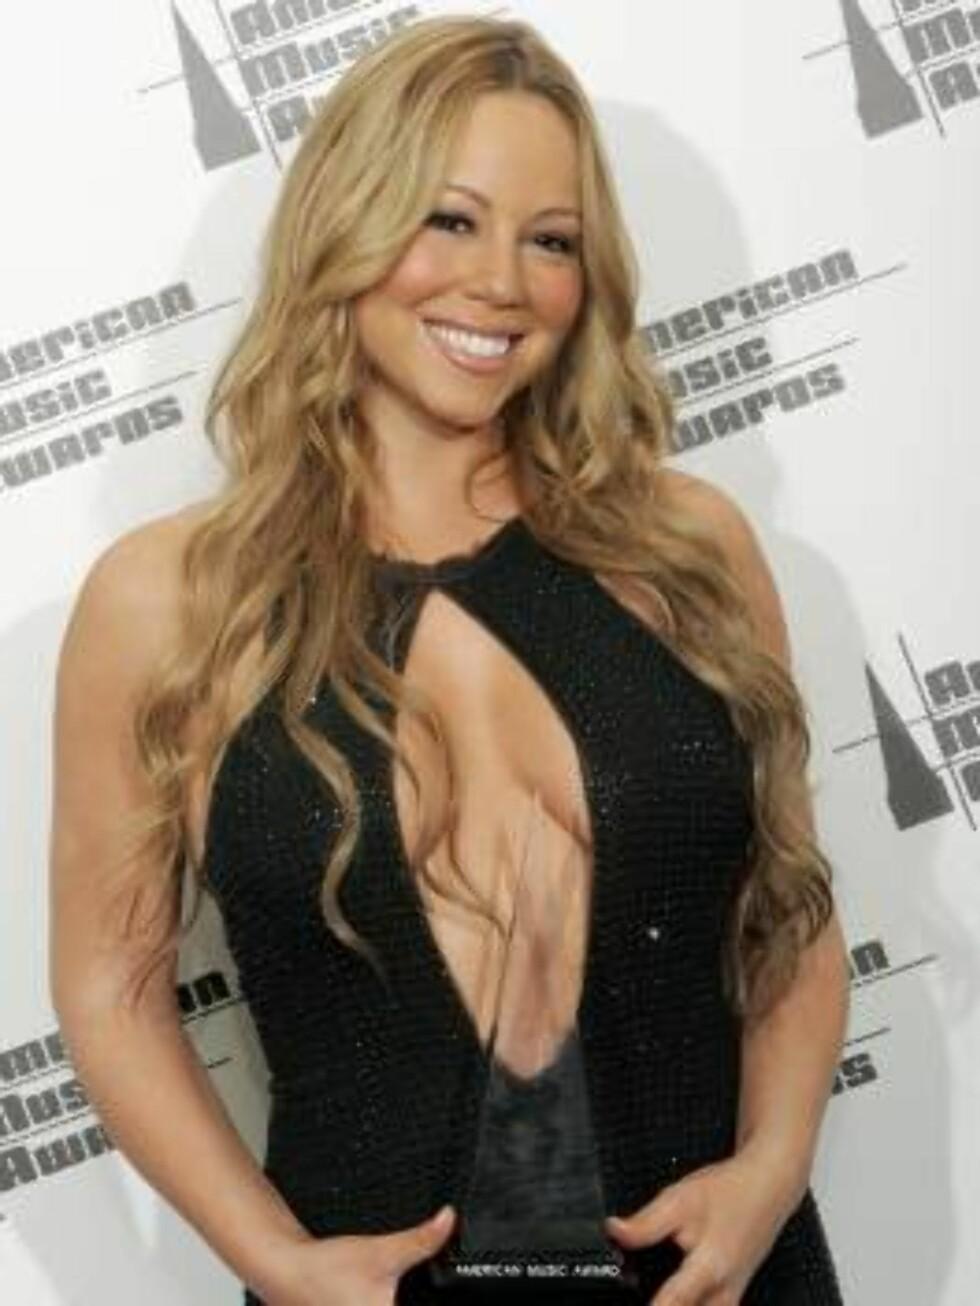 Mariah Carey holds the award for favorite soul /rhythm & blues female artist at the 33rd annual American Music Awards in Los Angeles on Tuesday, Nov. 22, 2005. (AP Photo/Kevork Djansezian) Foto: AP/Scanpix